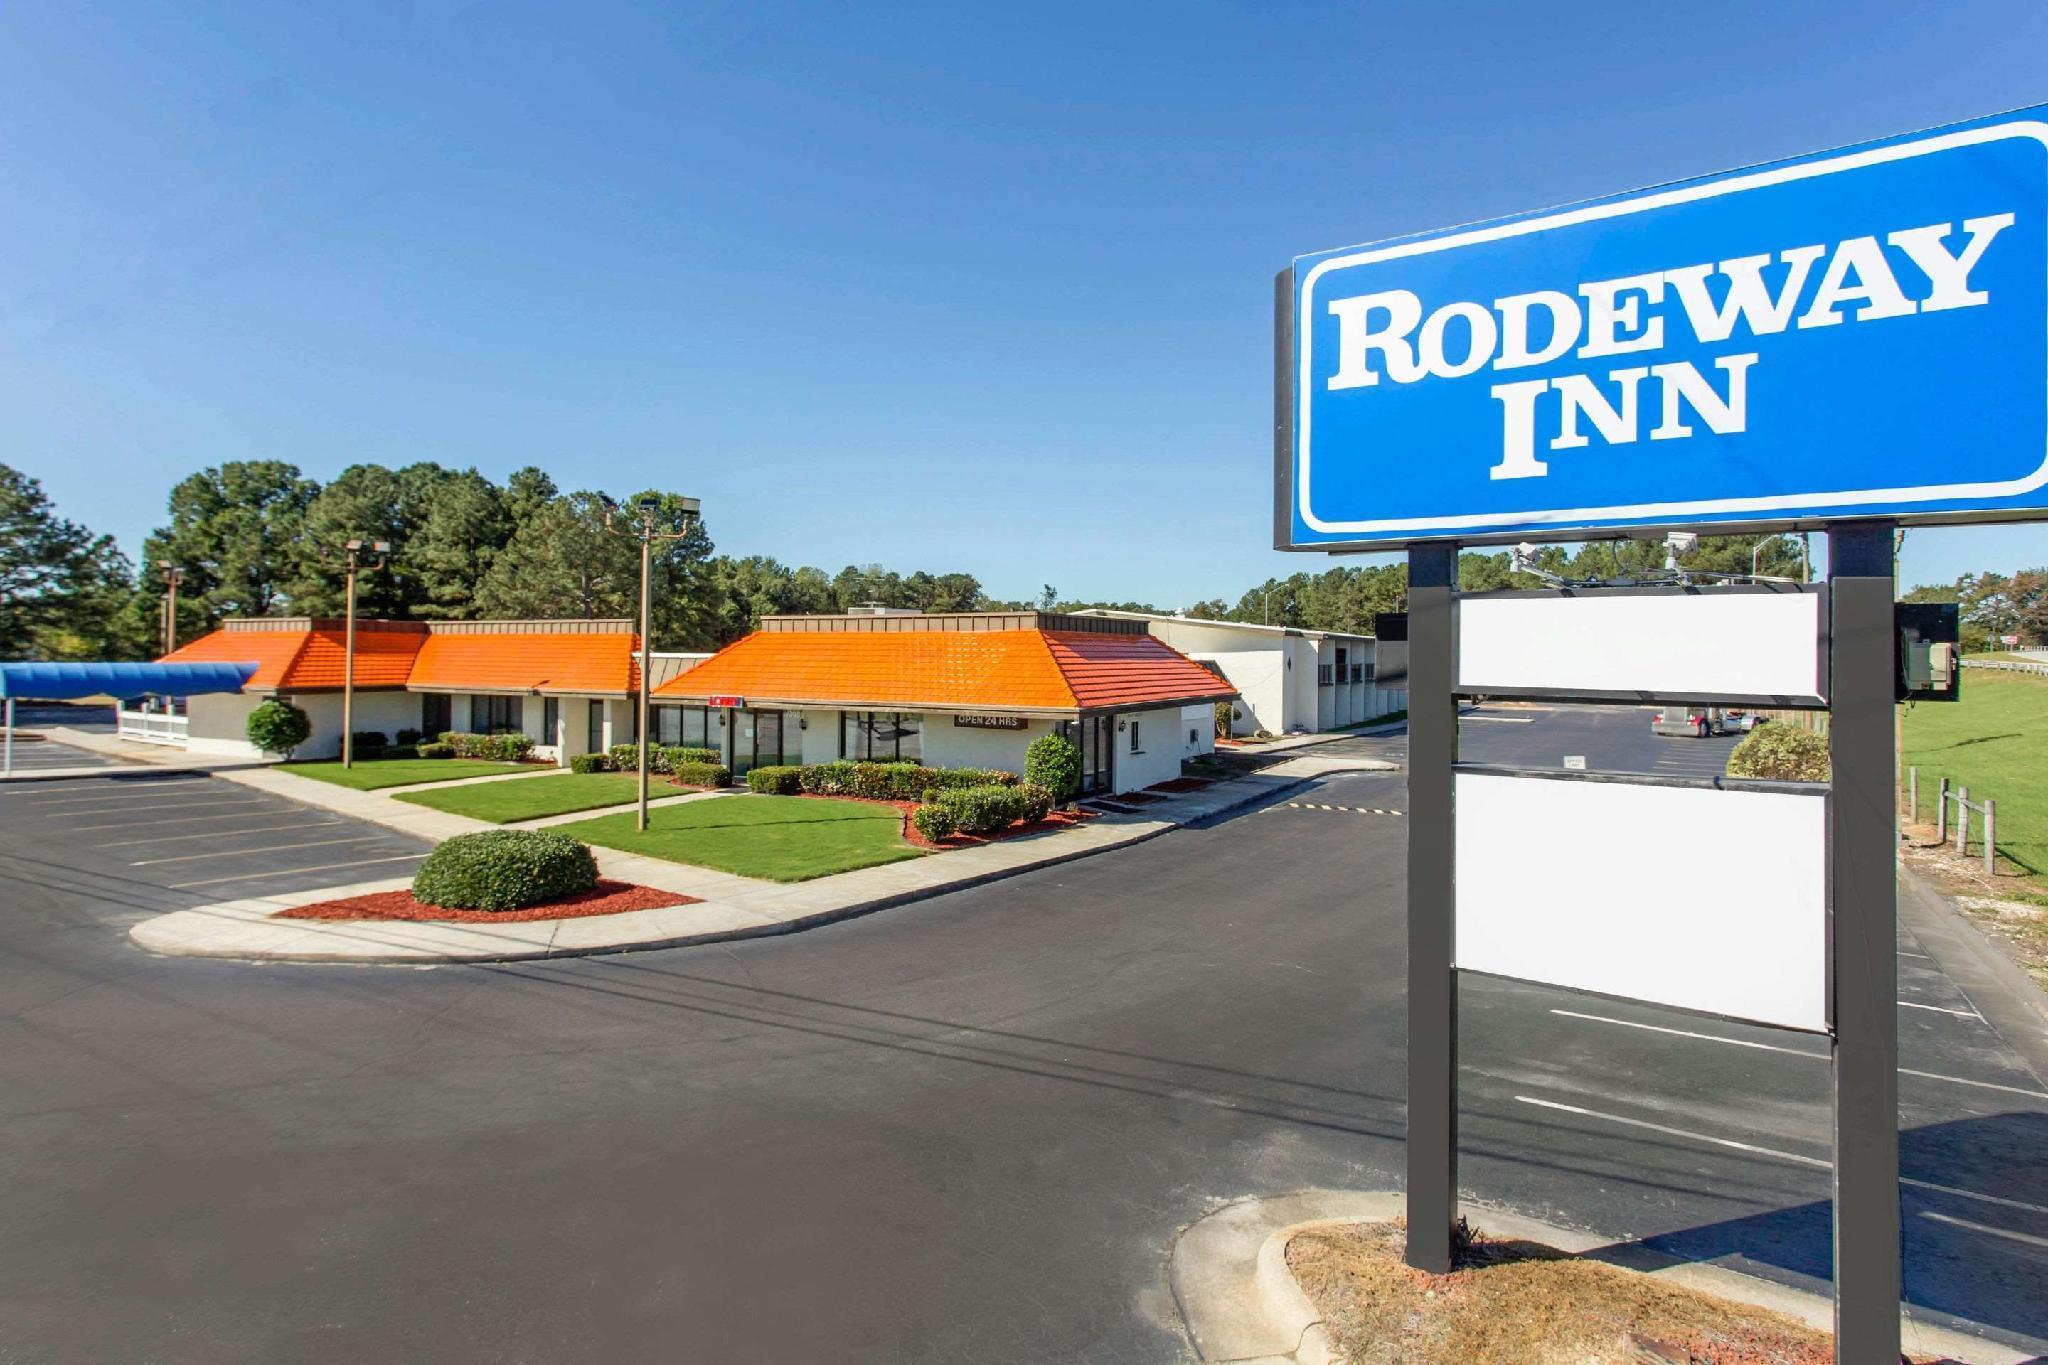 Rodeway Inn Battleboro Rocky Mount